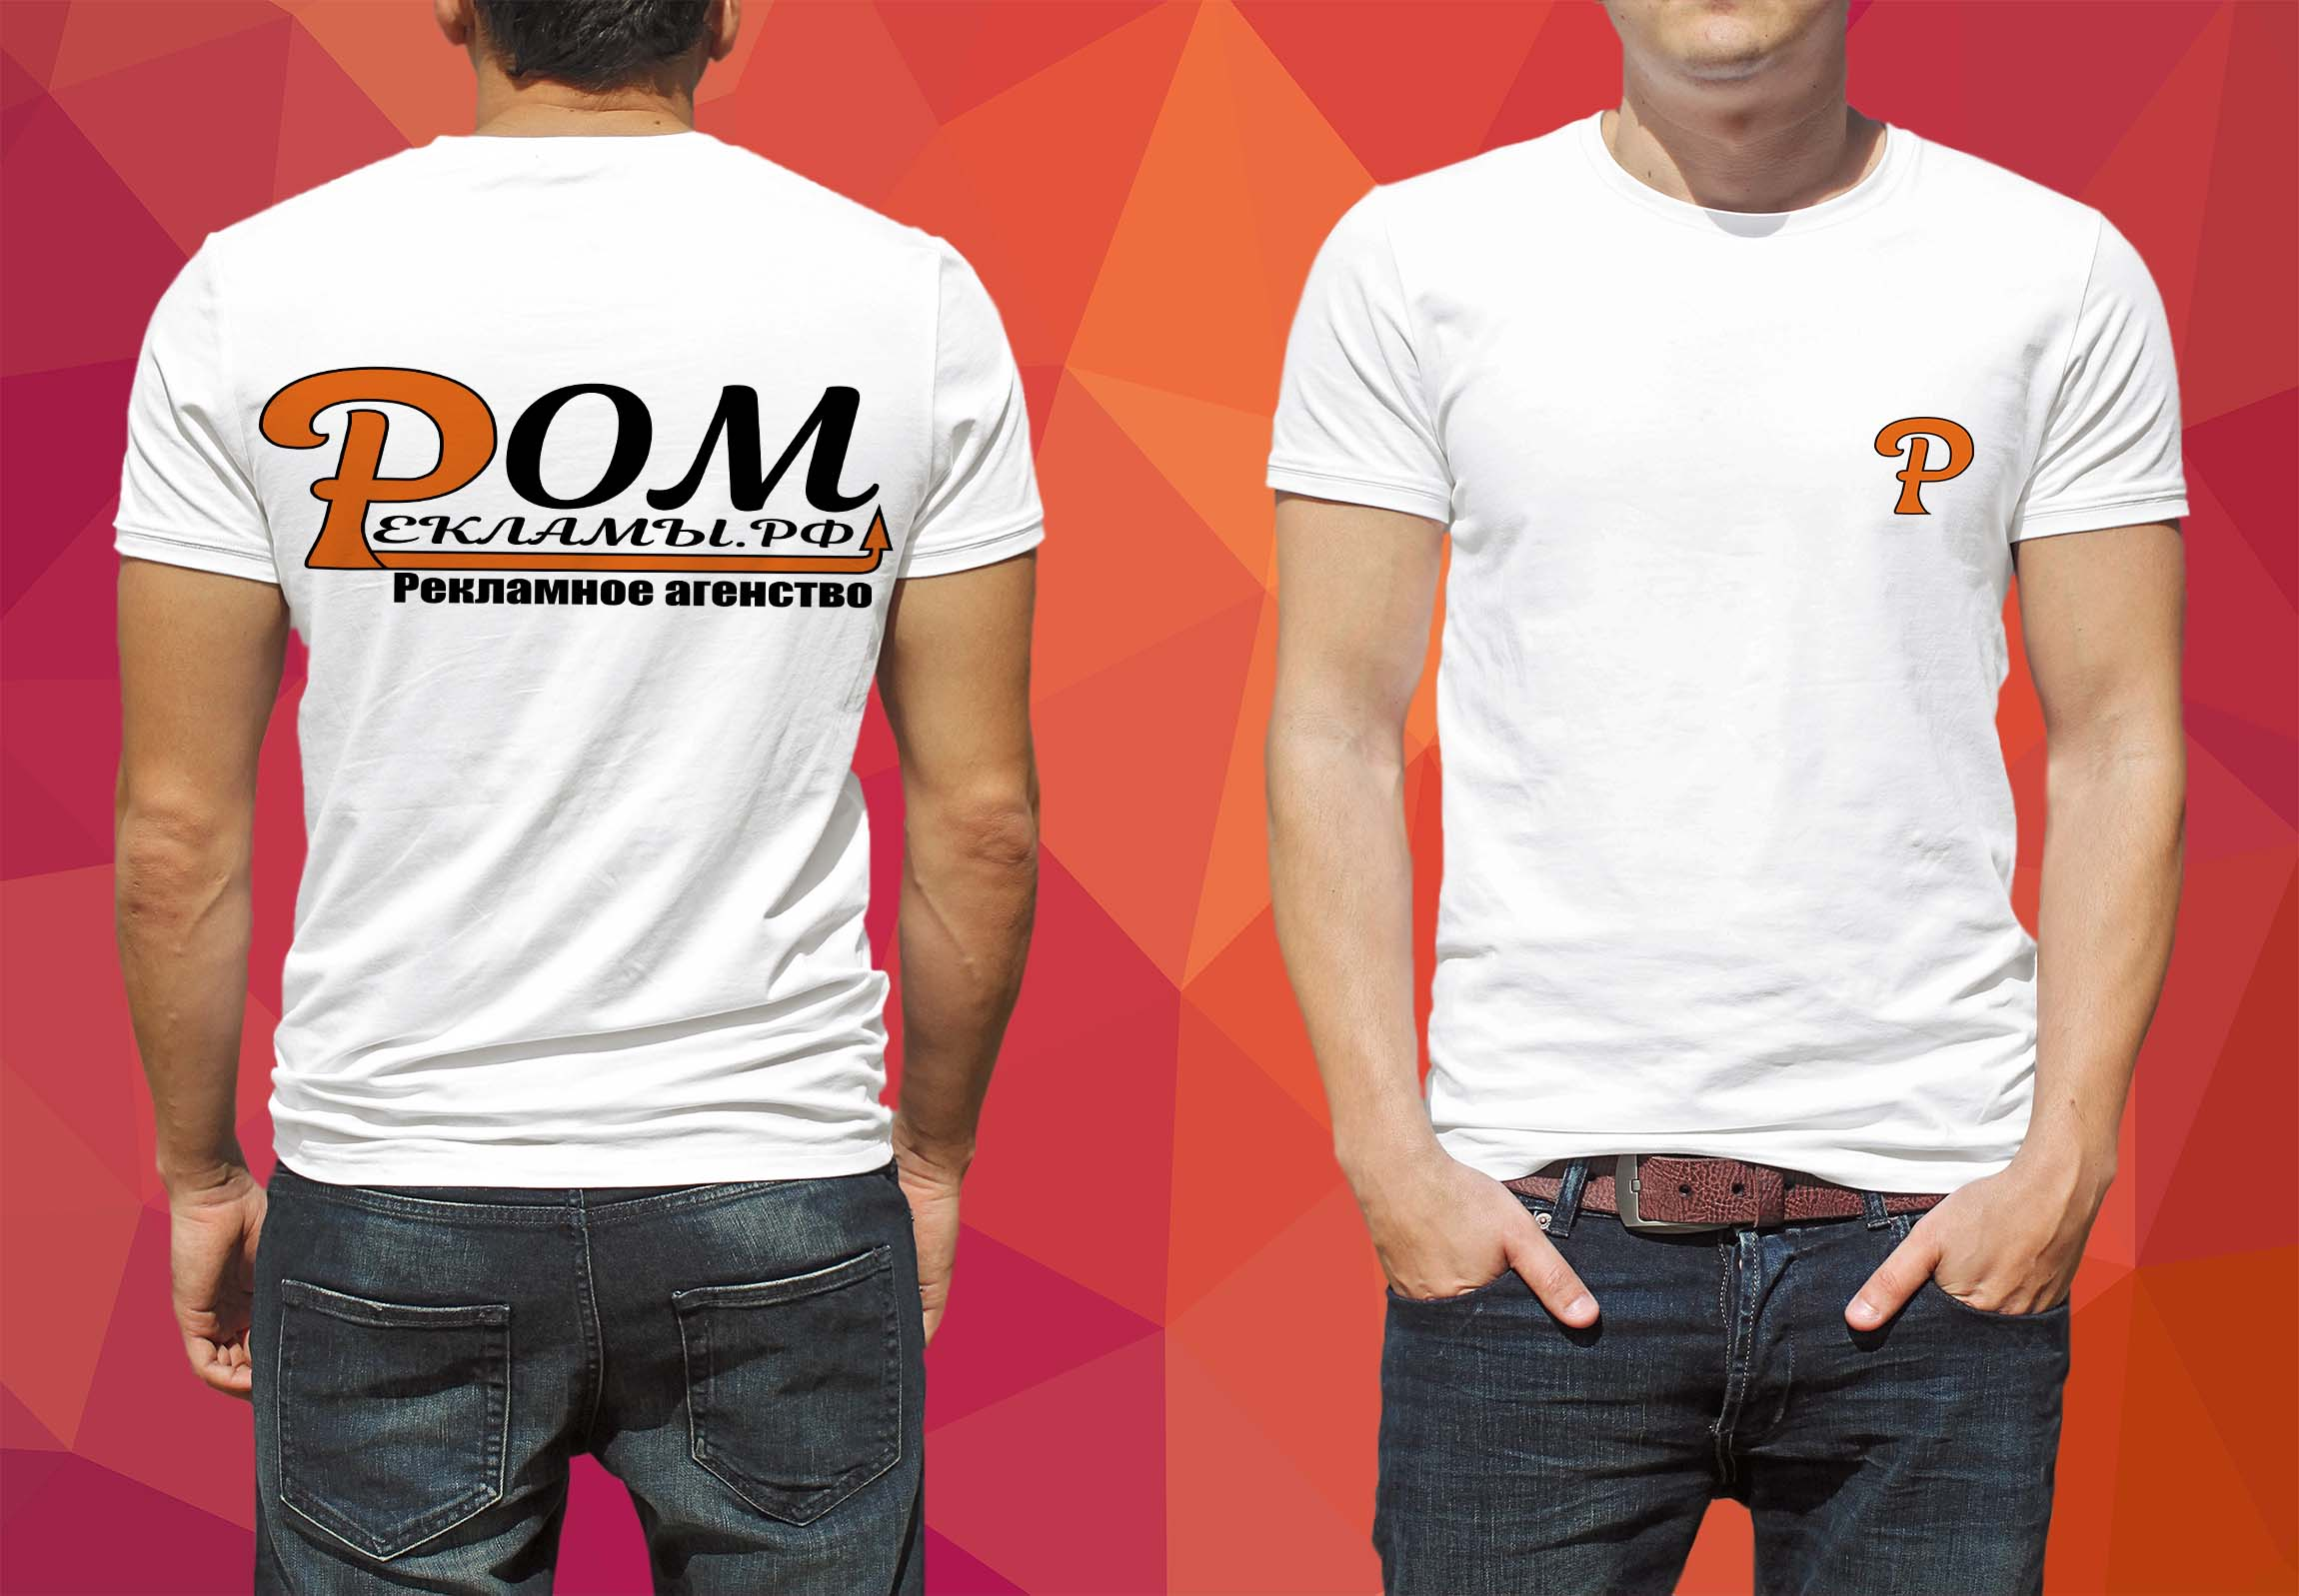 Дизайн логотипа рекламно-производственной компании фото f_4275edca568d4b23.jpg